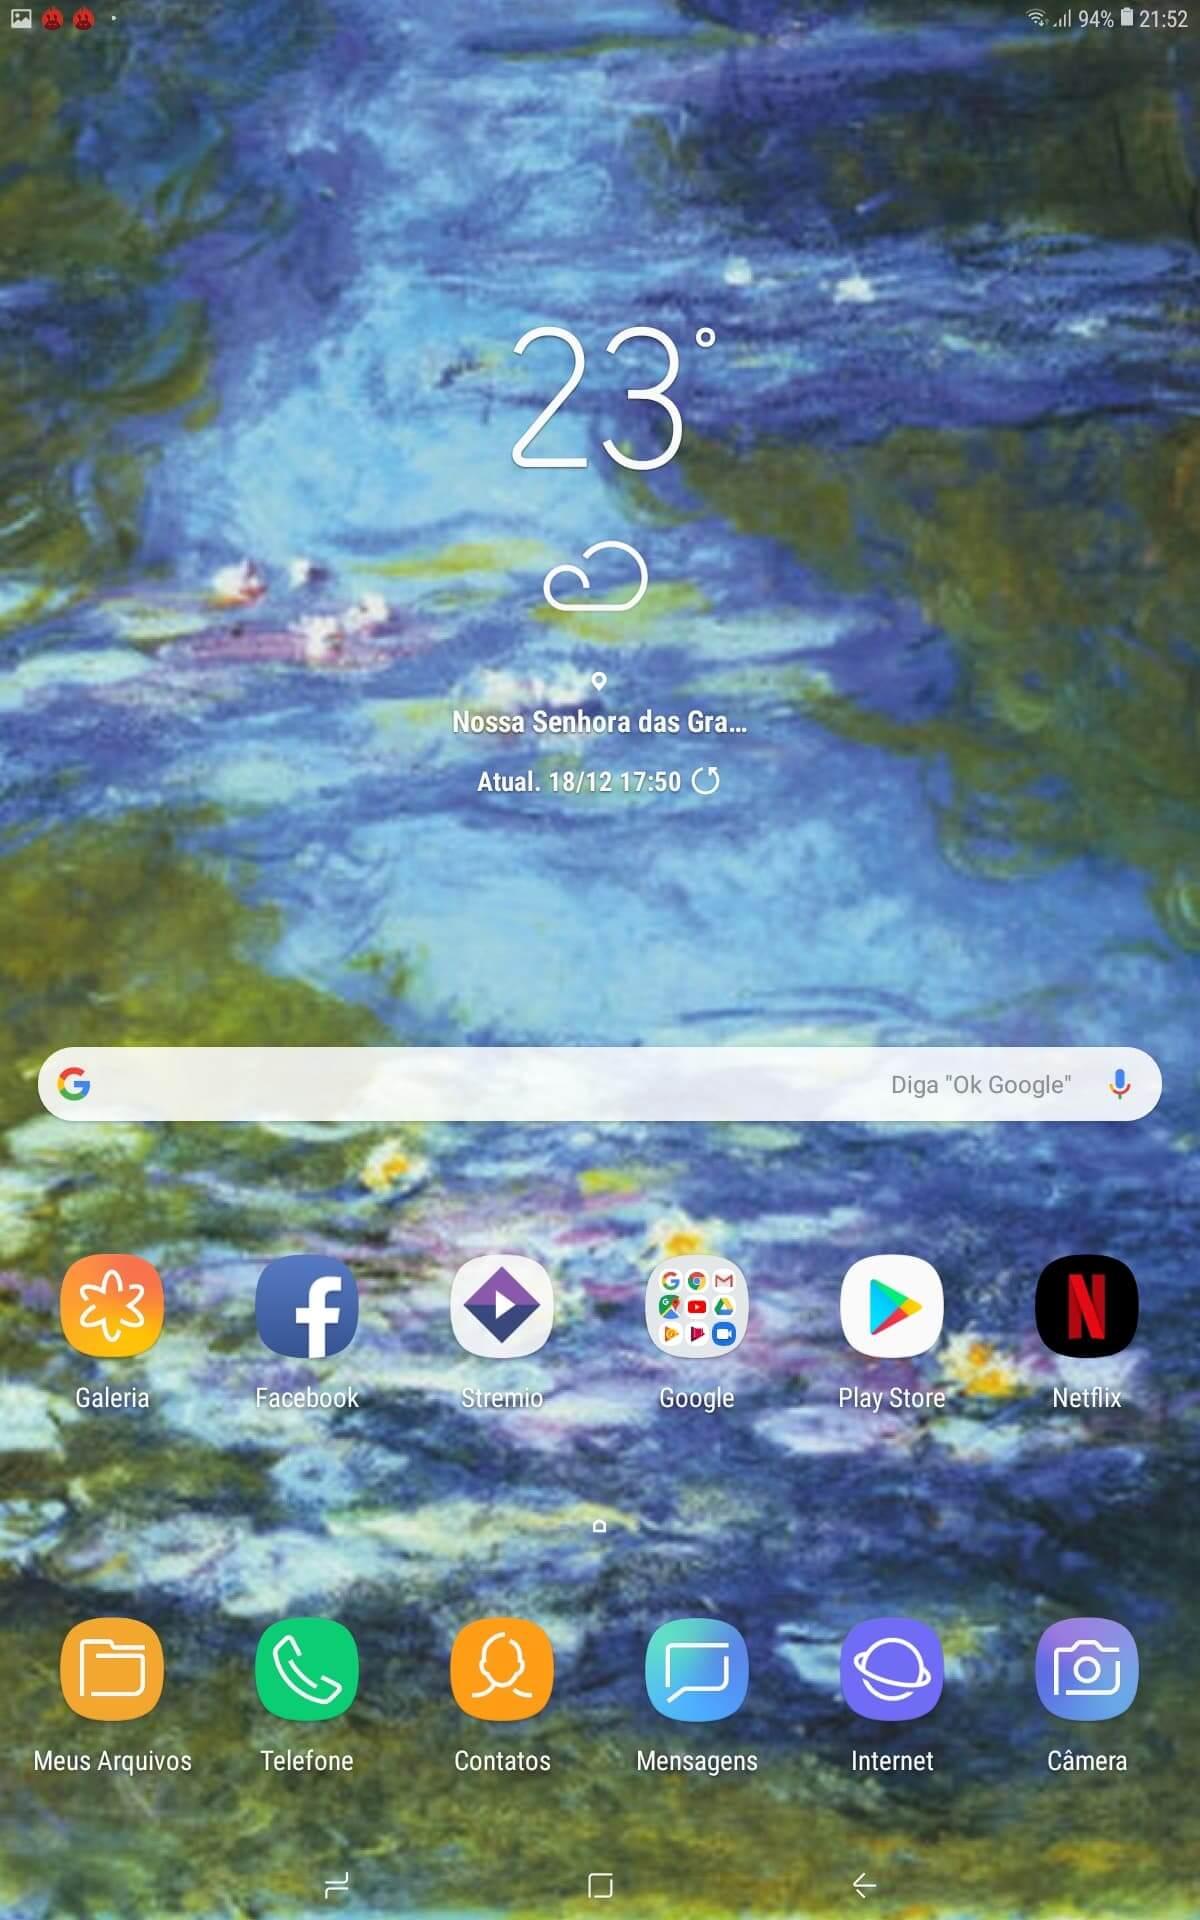 48385037 954329224768626 5011395122605064192 n - Review: Samsung Galaxy Tab A, o tablet perfeito para uso no dia-a-dia